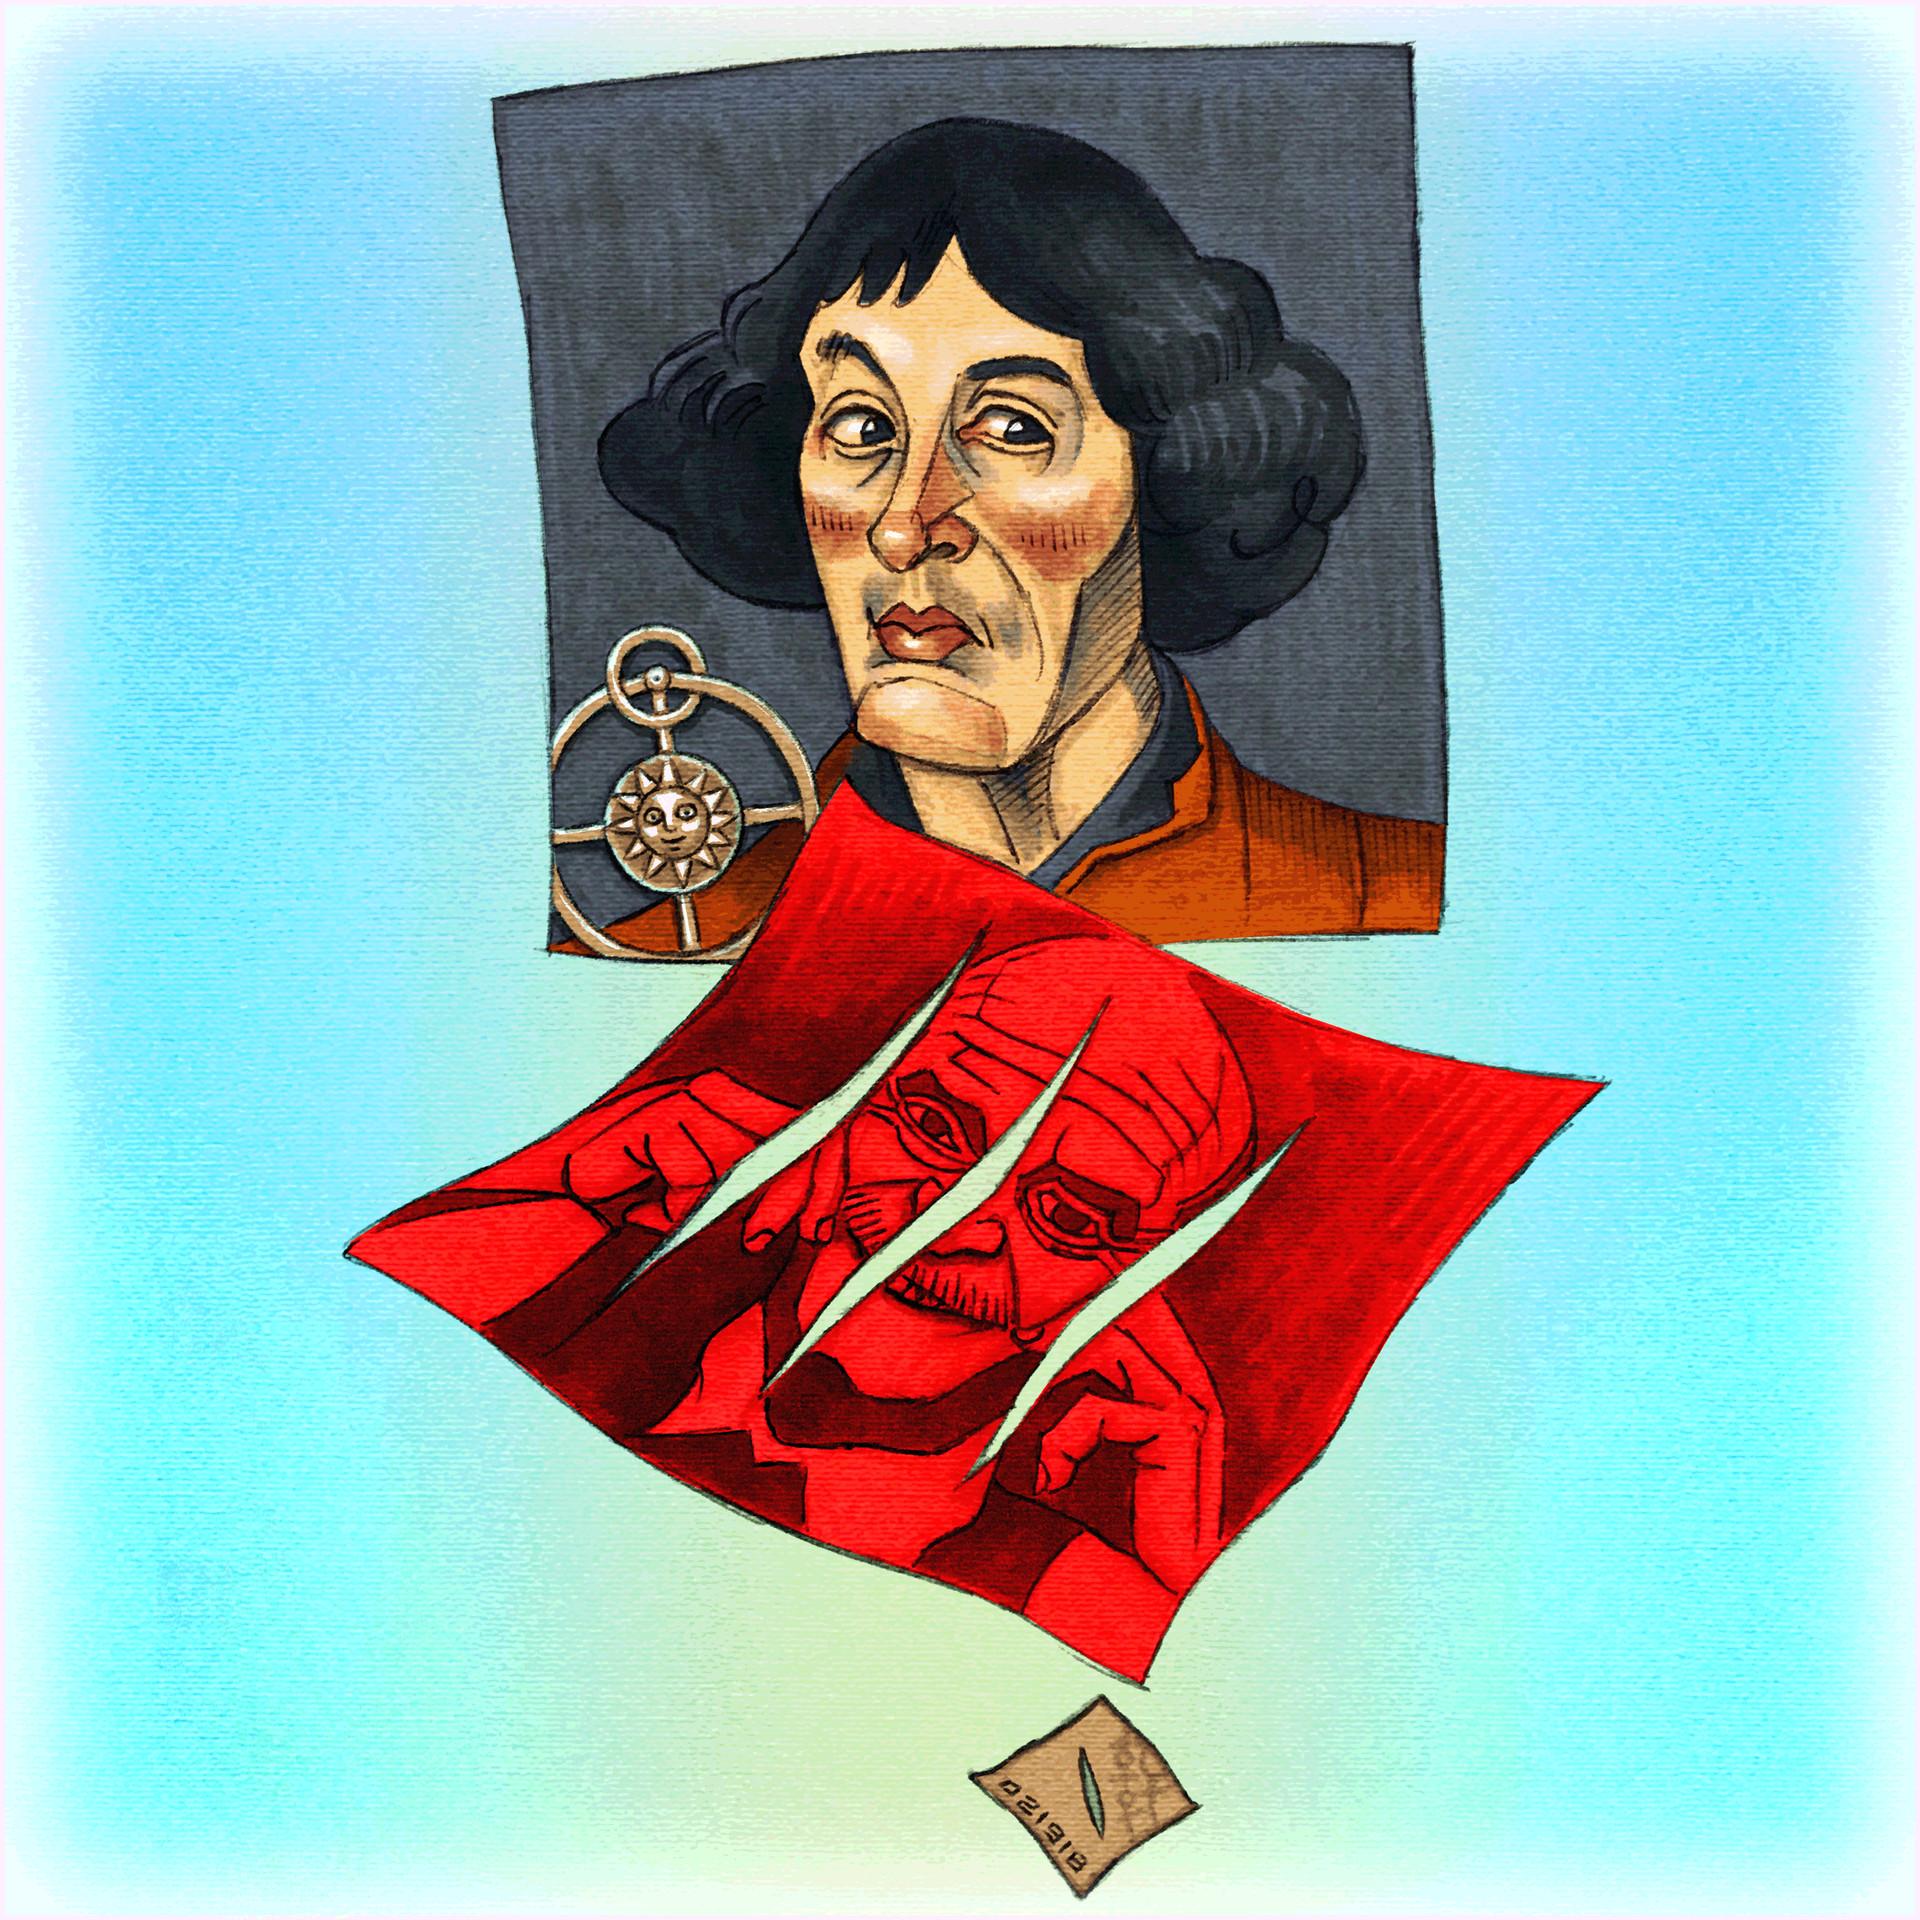 Day #15,152 - Copernicus + Fontana